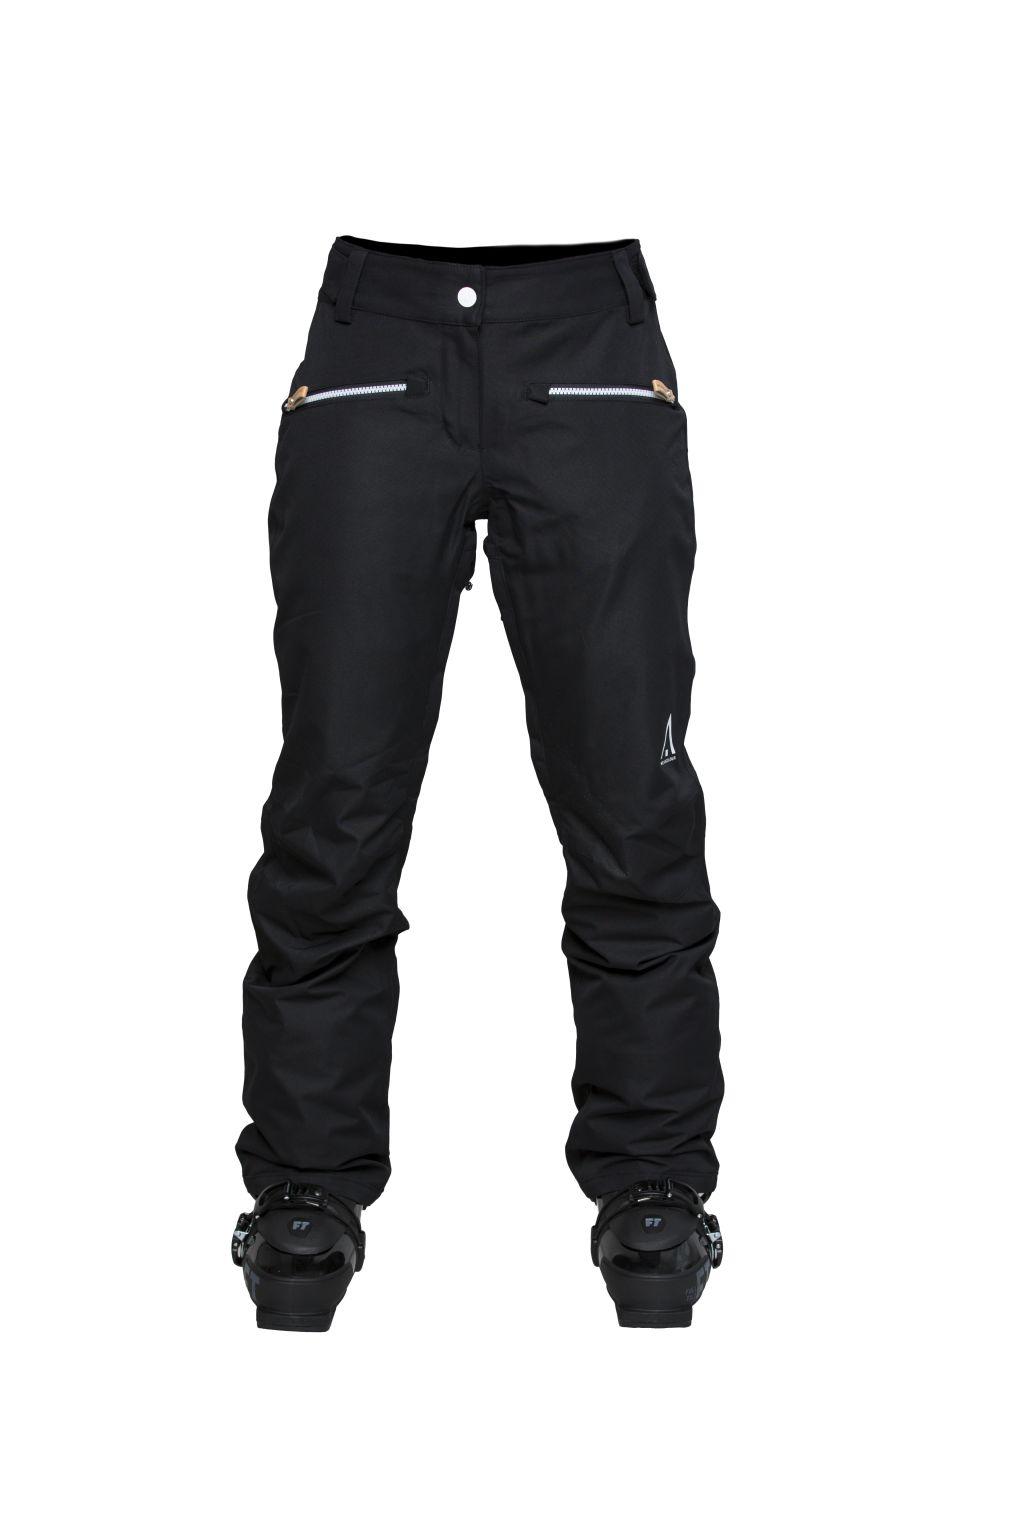 Wear Colour Cork Pant W - Naisten toppahousut - Intersport 8b0dfb56f2